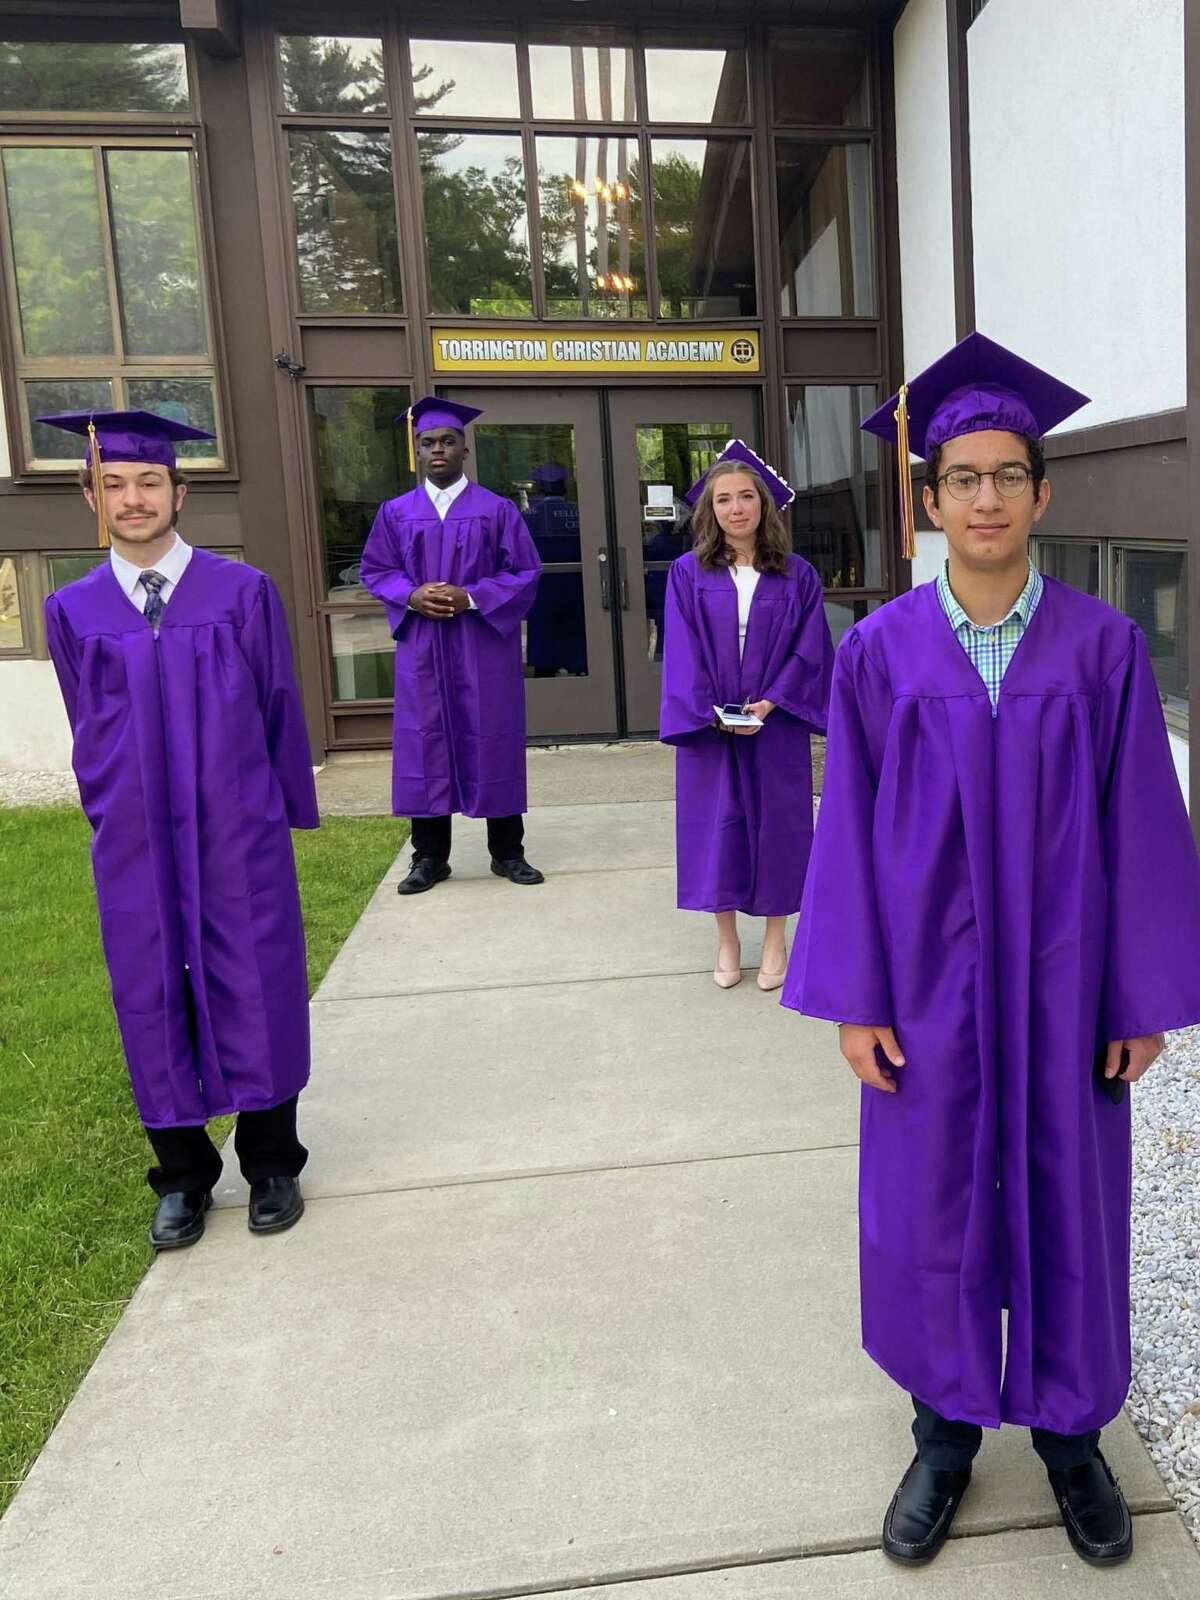 Torrington Christian Academy held its graduation ceremonies June 5. Seniors Andrea Lopez, Nathan Versari, and Damon Hopkins, all of Torrington, and David Fernandez of Naugatuck, are this year's graduates.